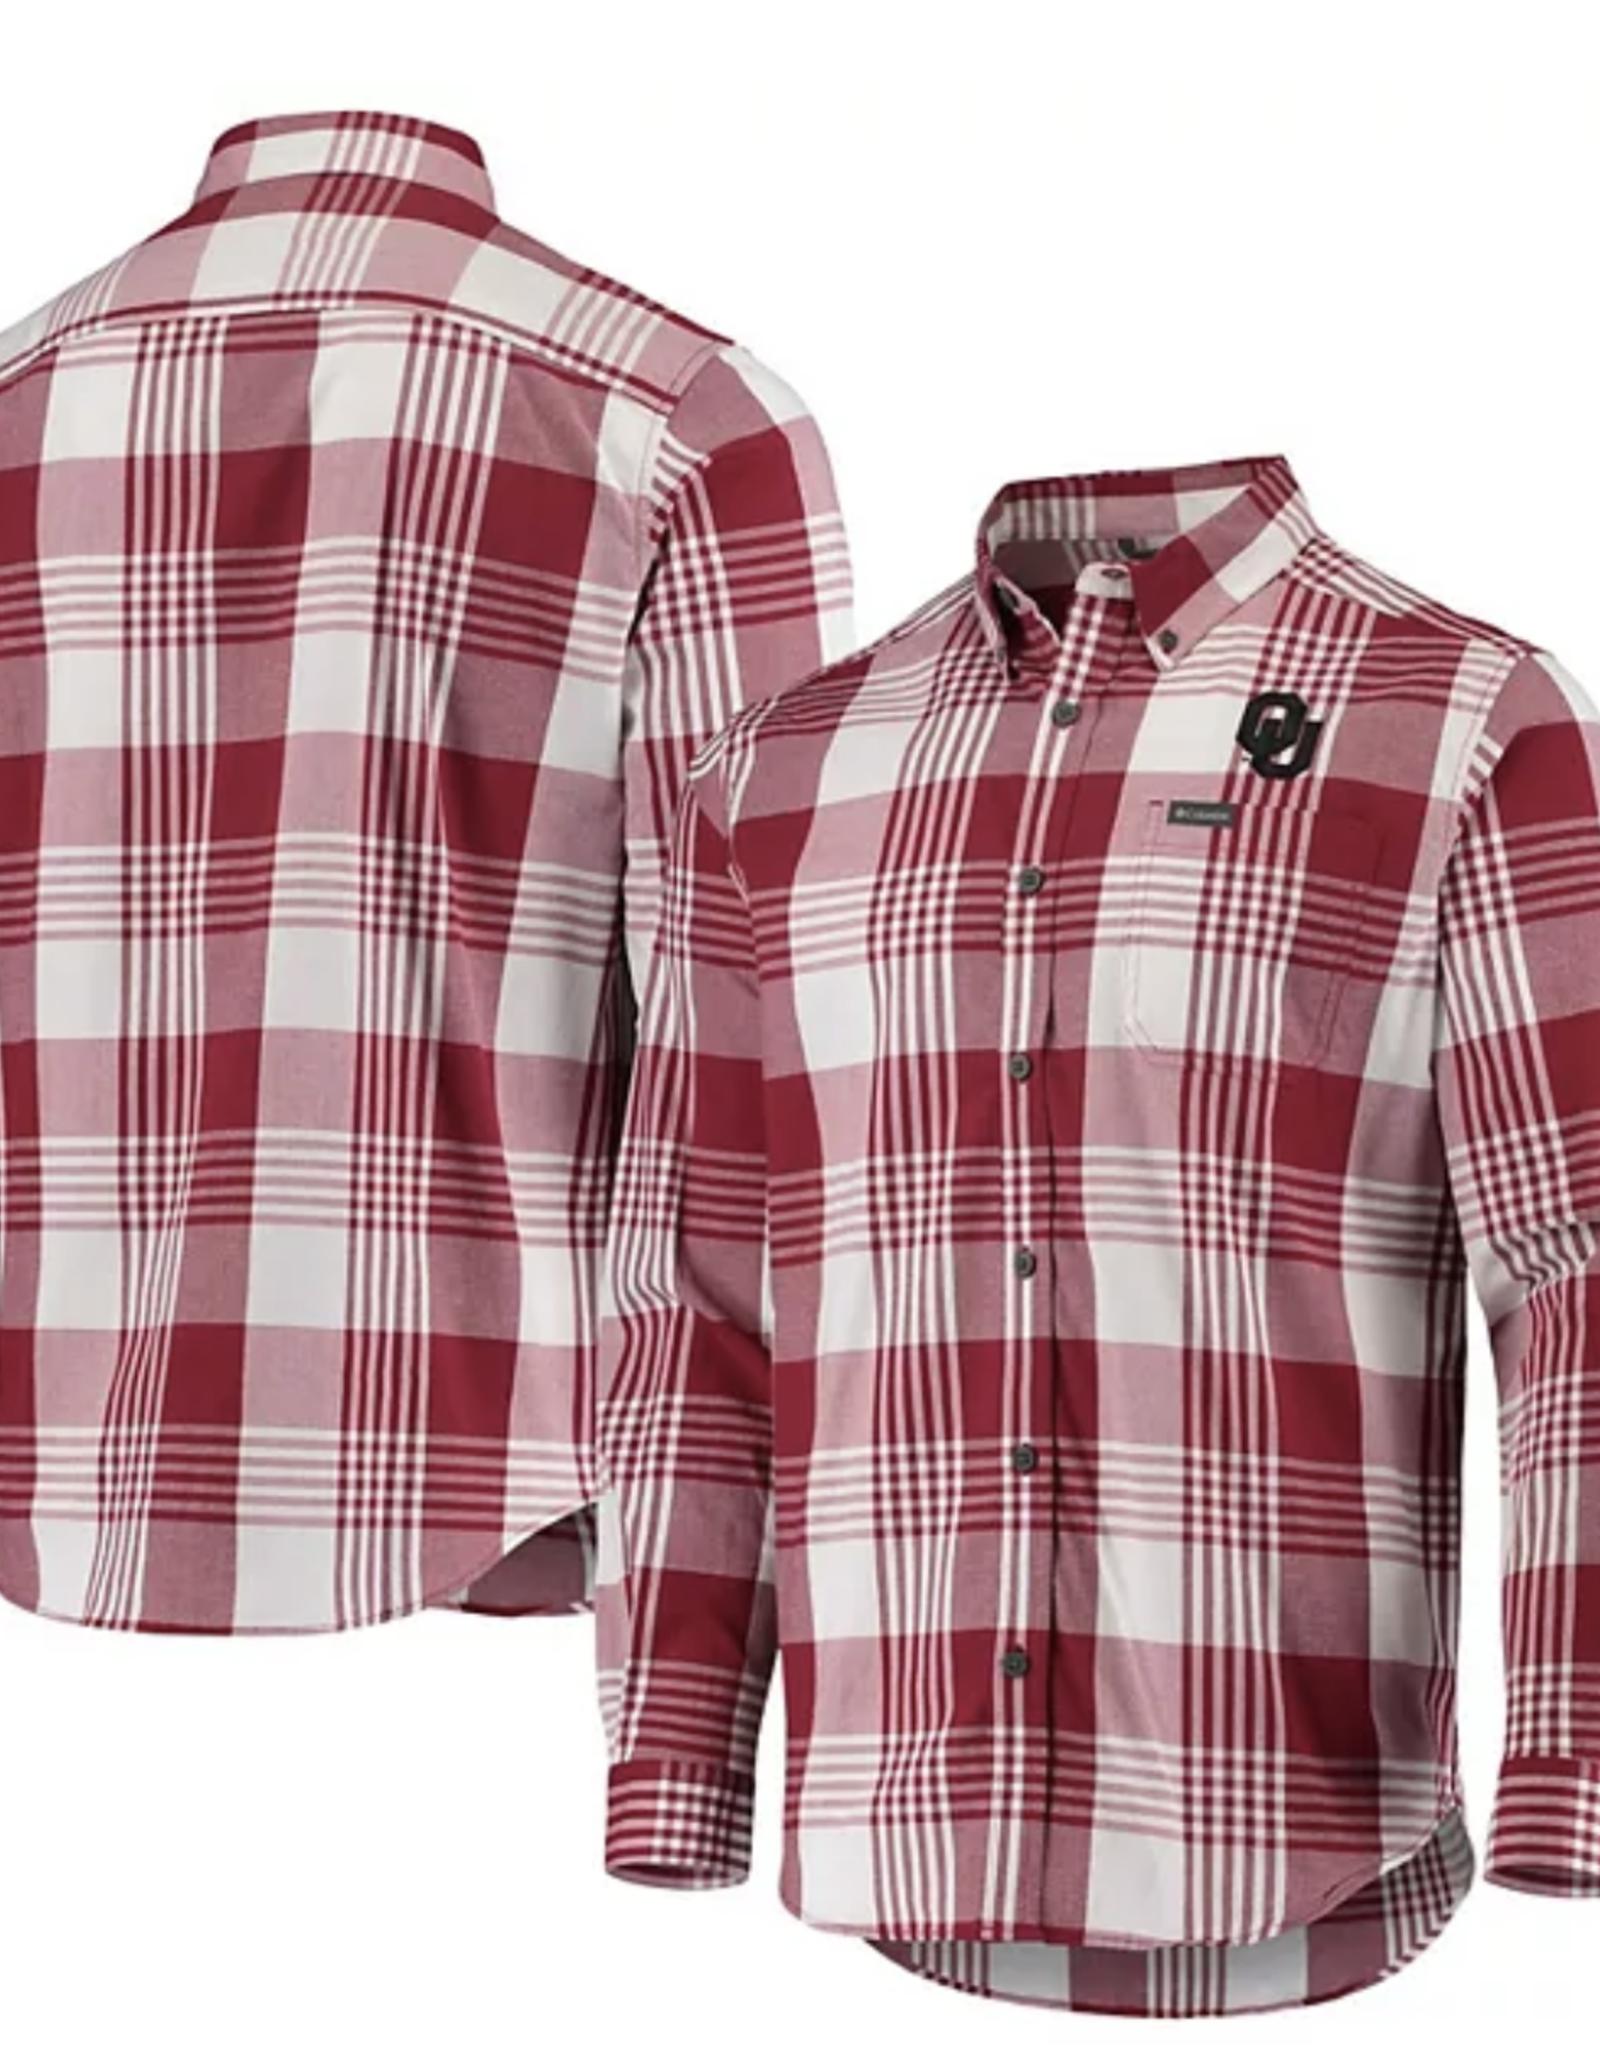 Columbia Men's Columbia OU Rapid Rivers LS Plaid Shirt